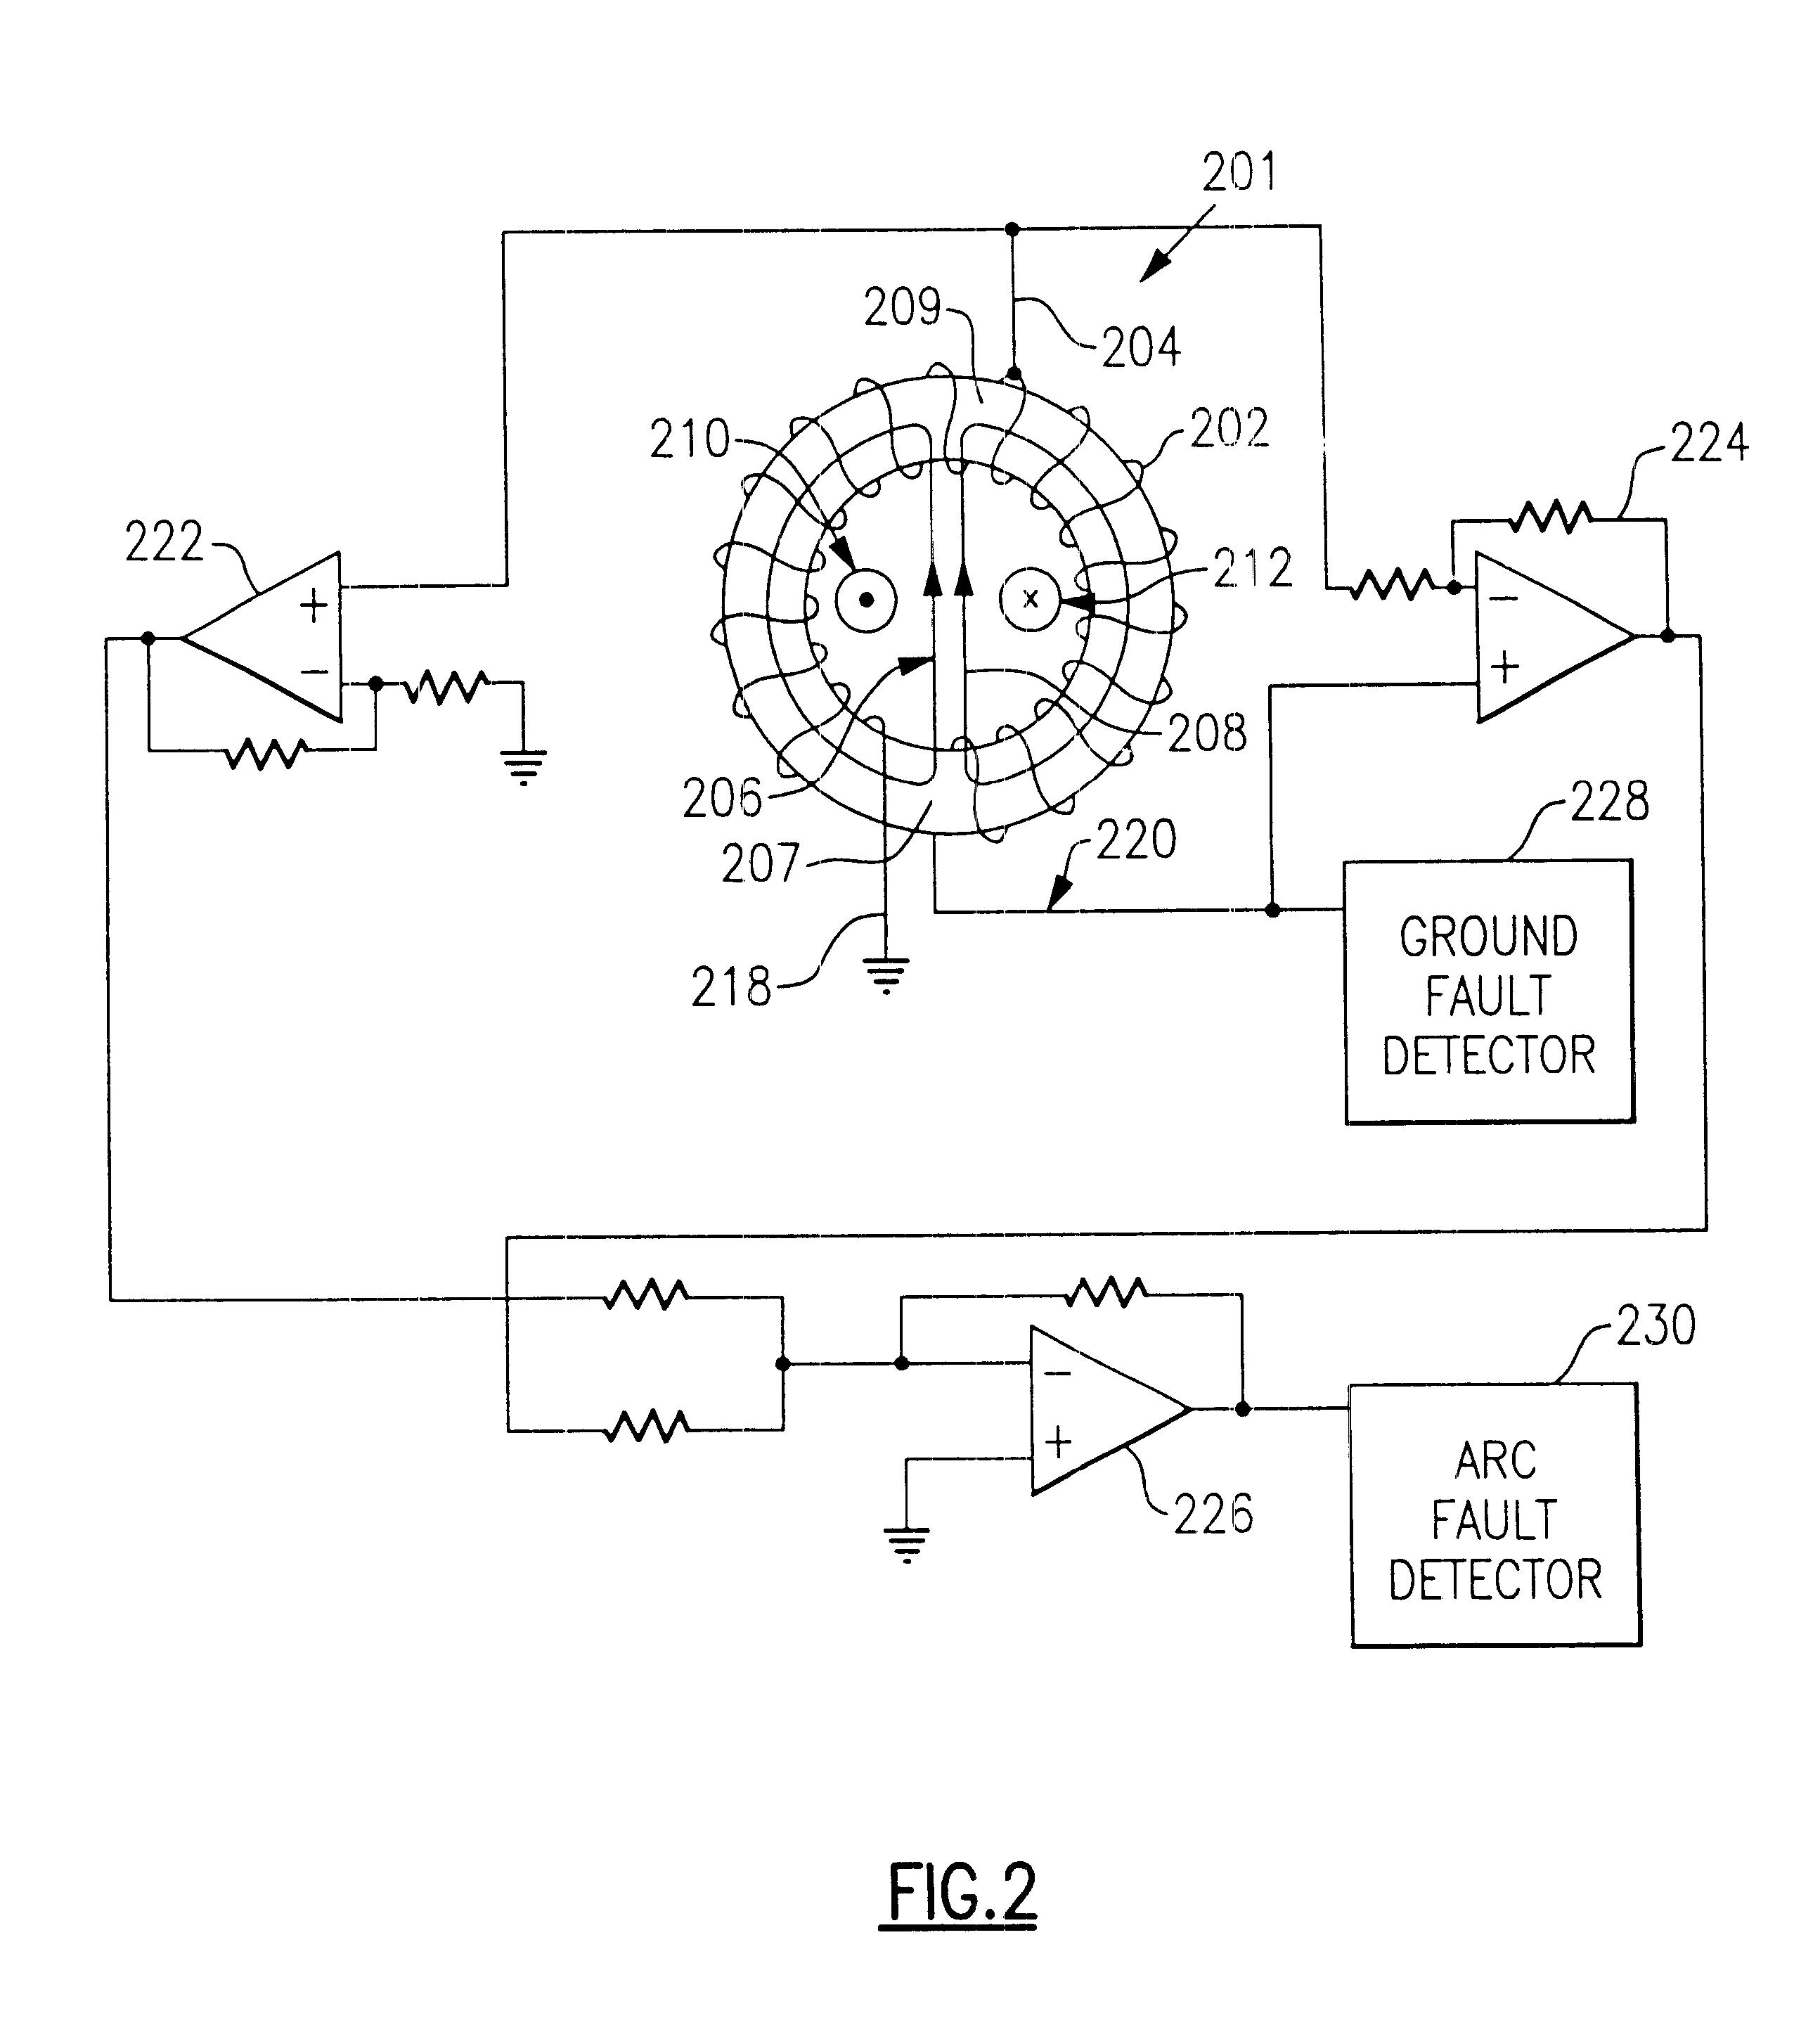 arc fault interrupt circuit topology